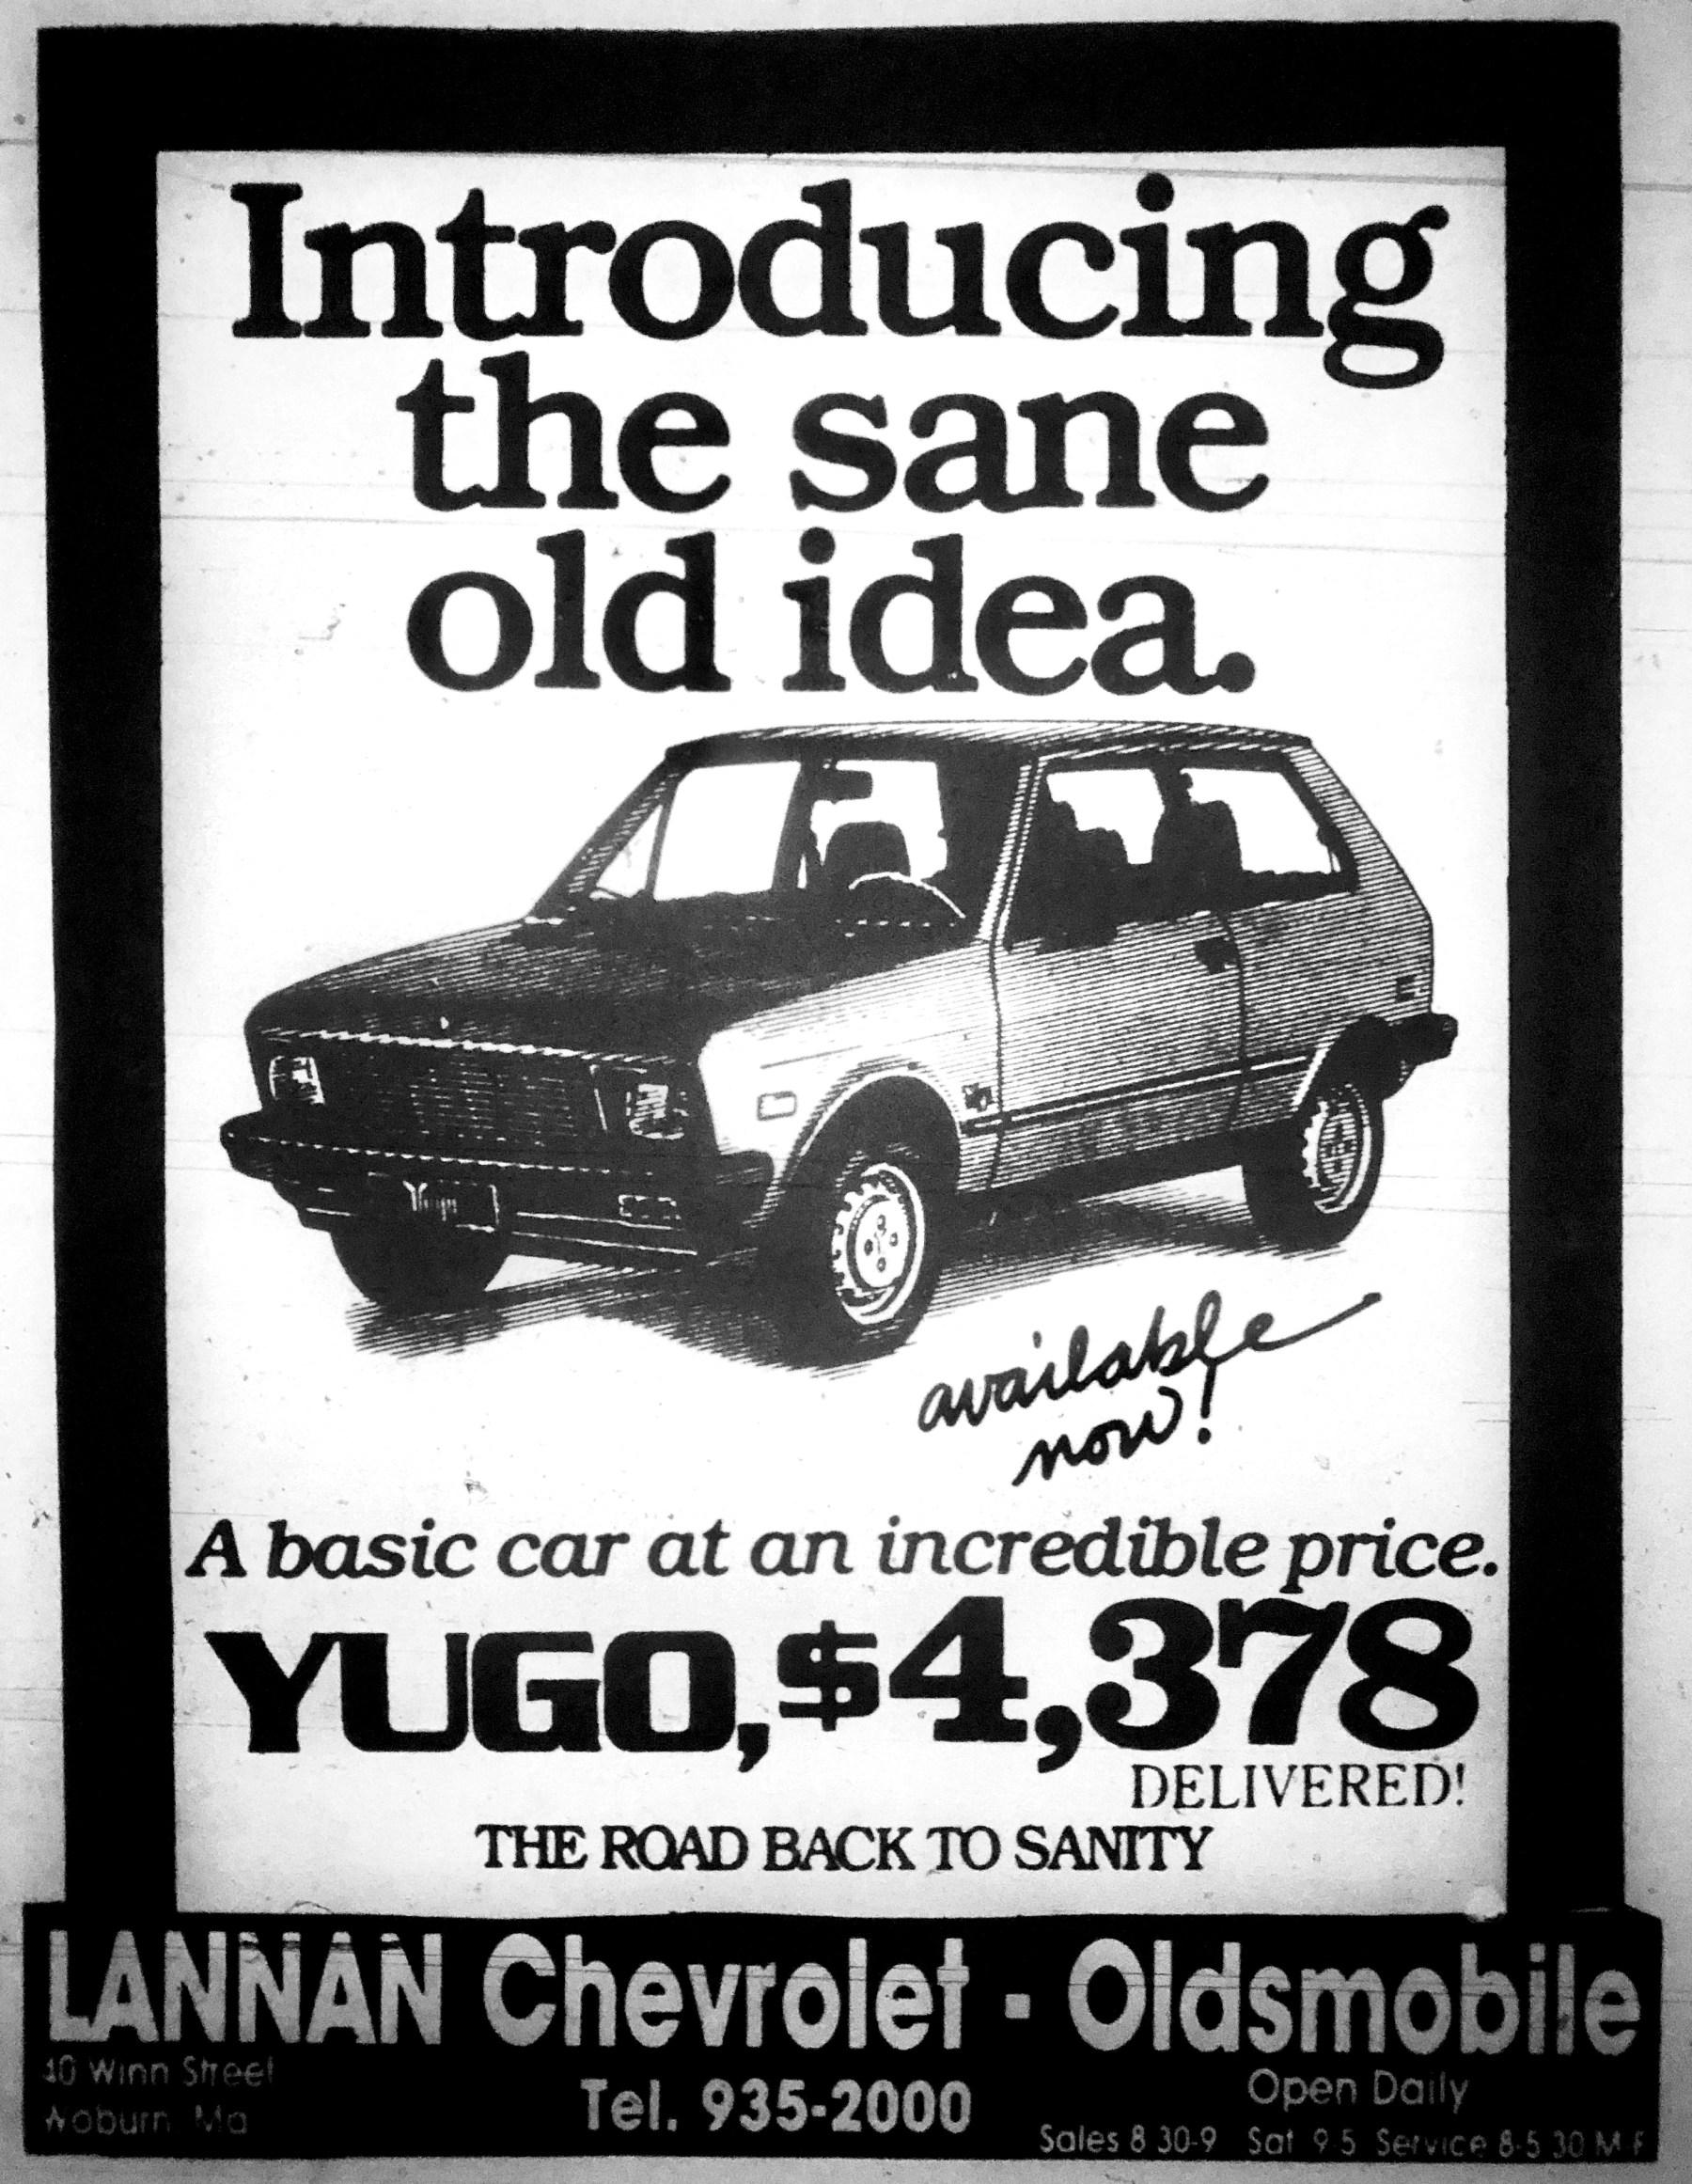 Yugo at Lannan Chevrolet